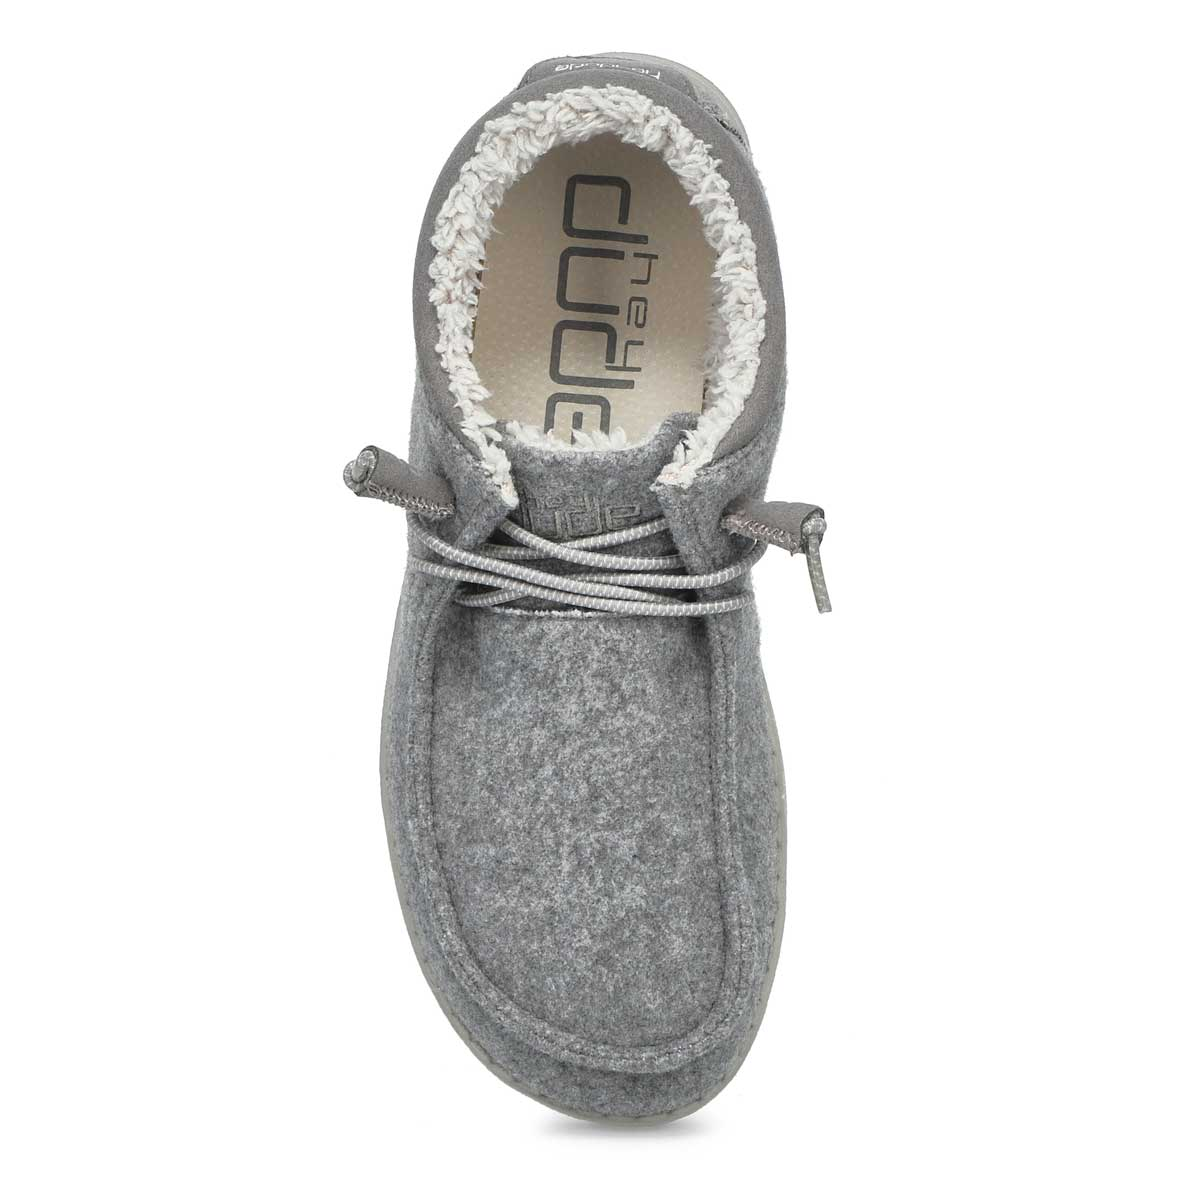 Chaussure tout-aller Cindy, femmes  - Gris